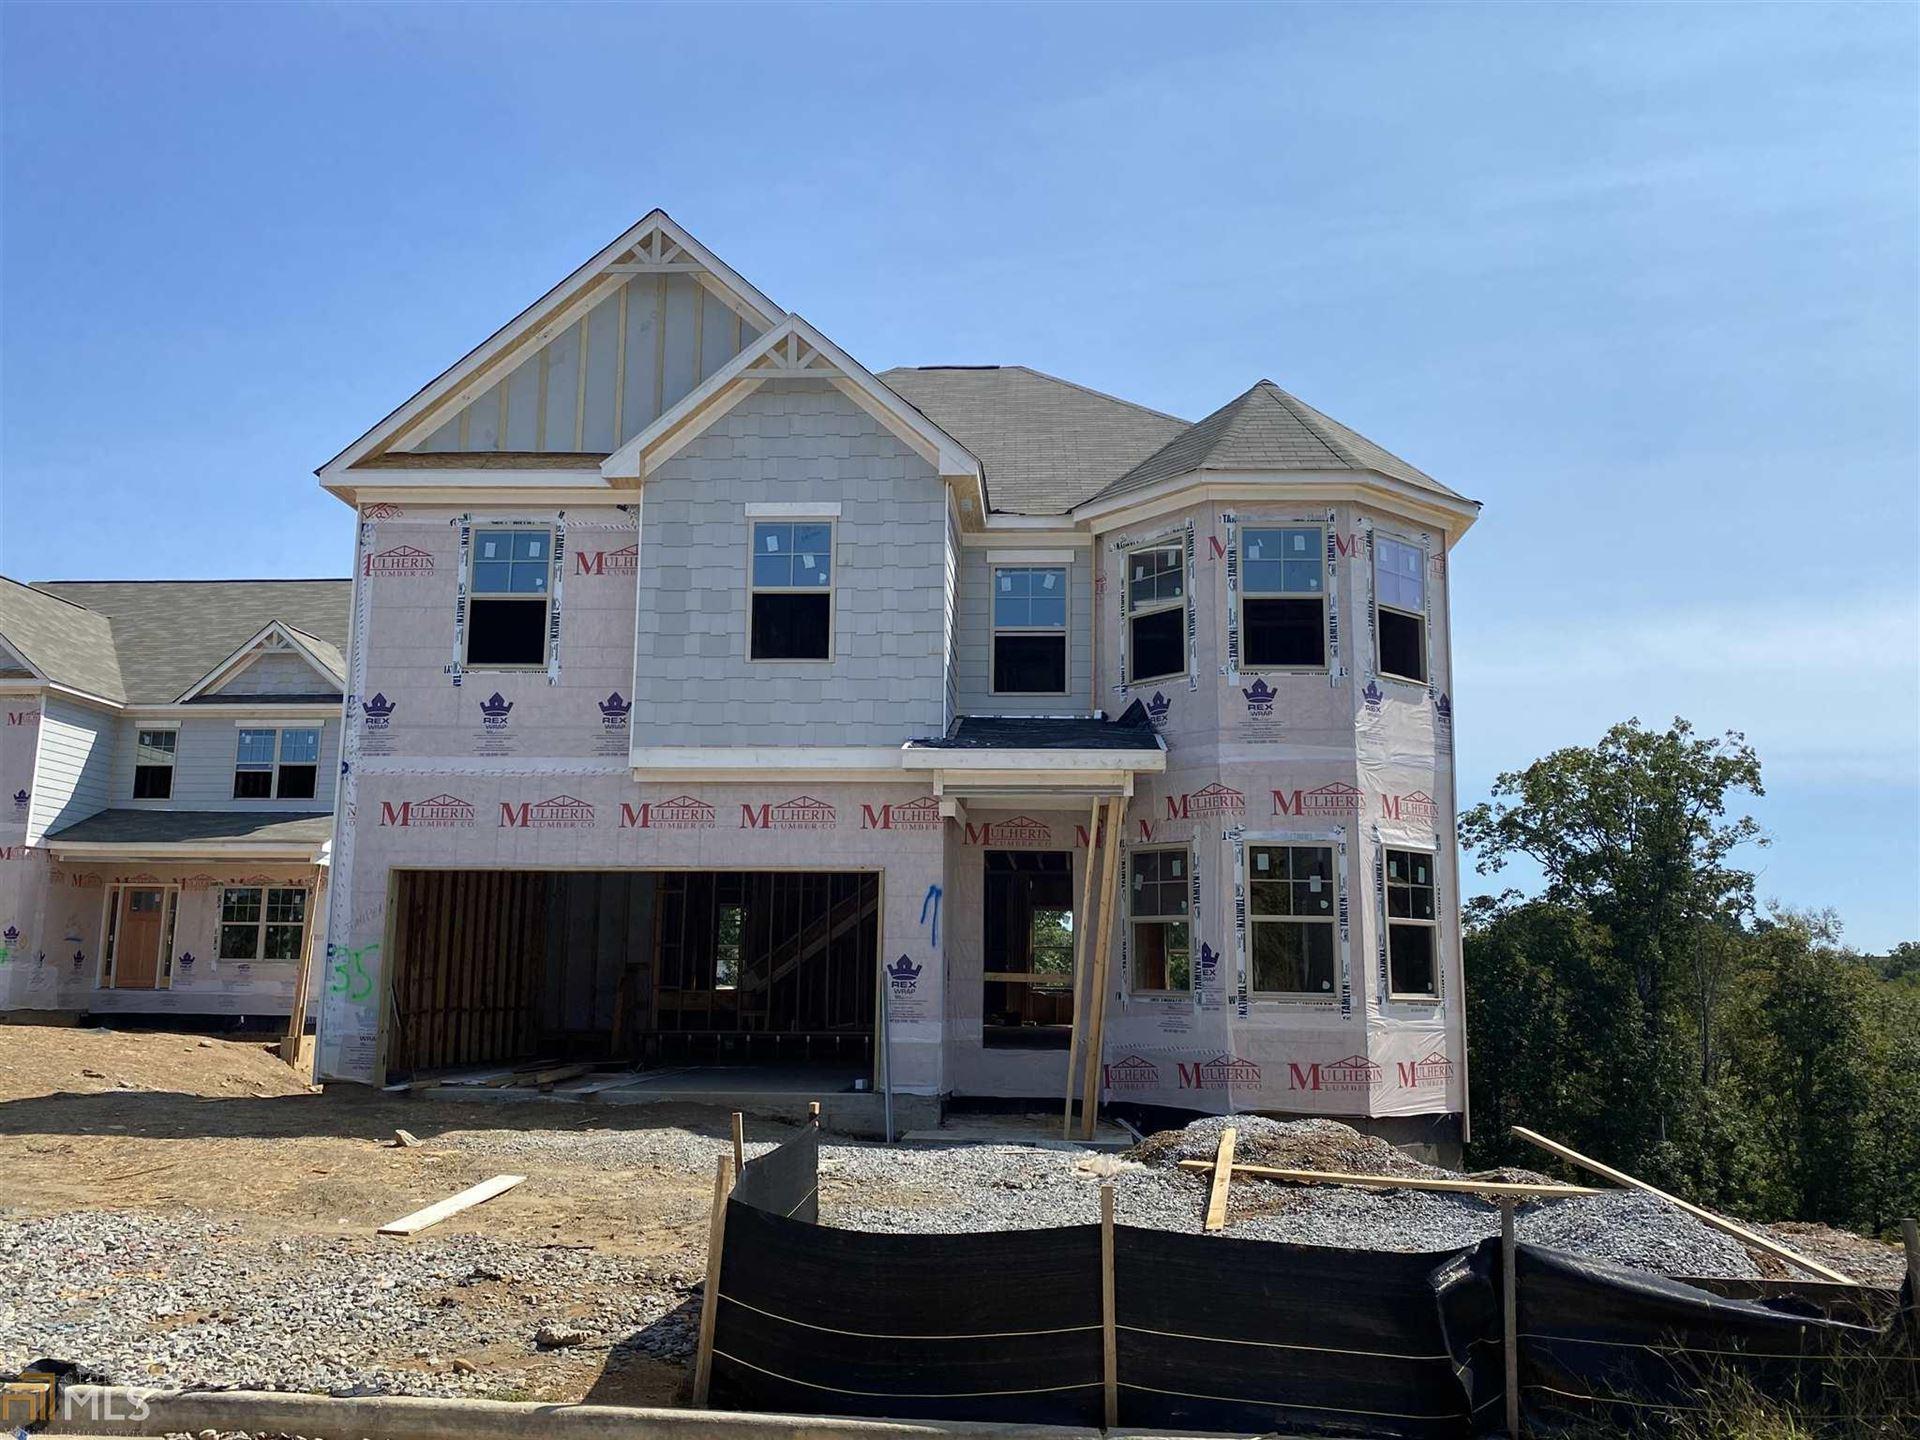 1596 Castleberry Ln, Buford, GA 30518 - MLS#: 8857025